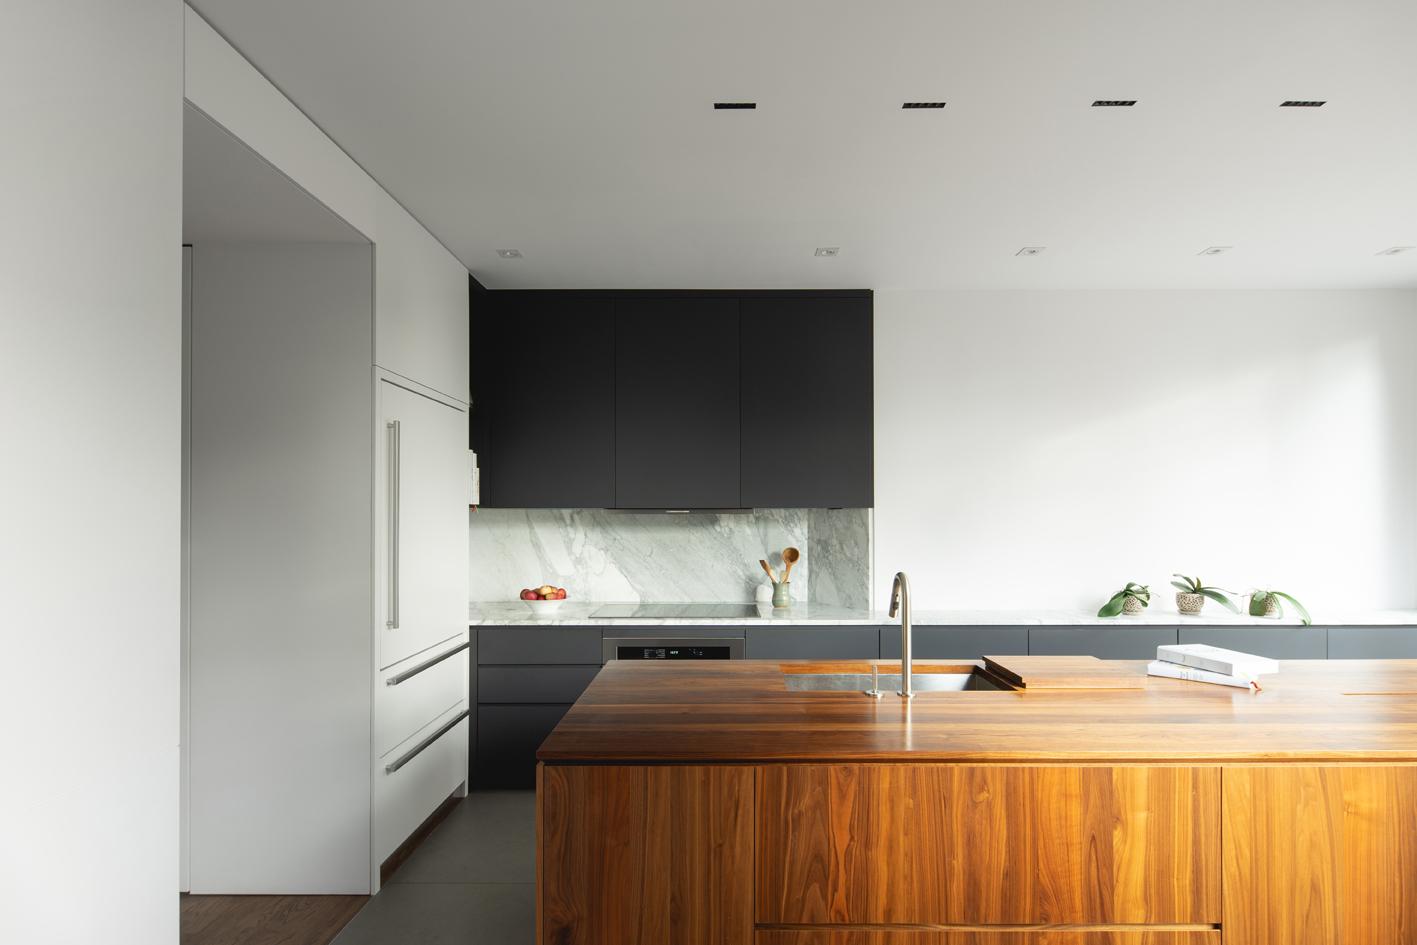 Maison Upper Lansdowne_1.4_Natalie Dionne Architecture_Raphaël Thibodeau_01.jpg